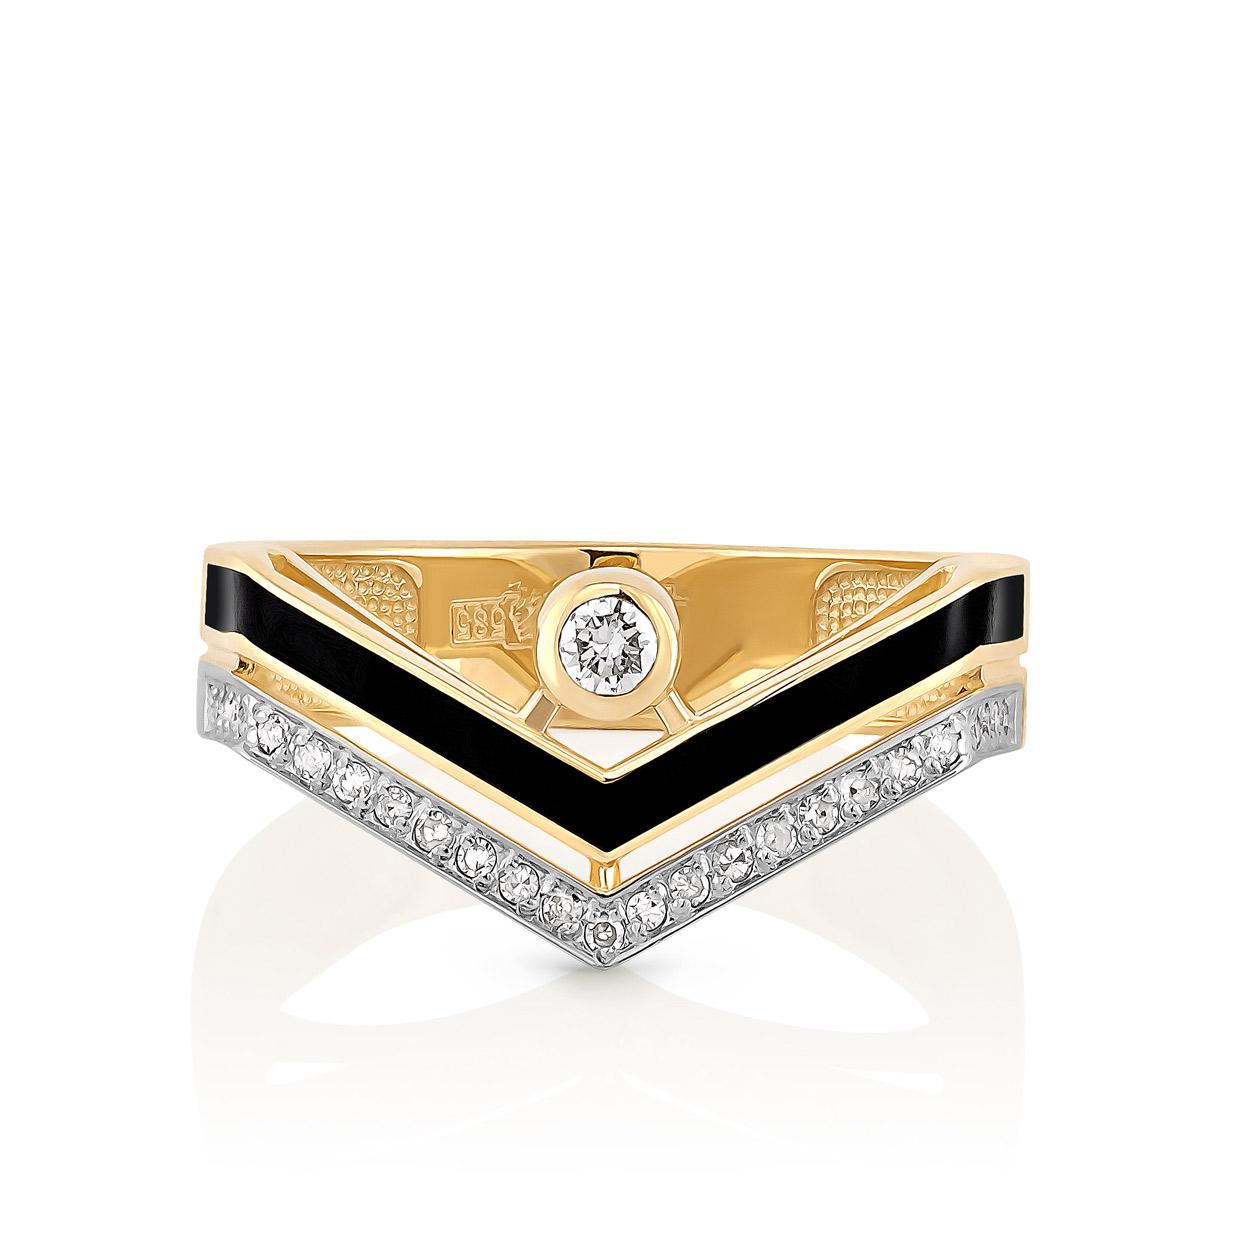 Кольцо из лимонного золота Бриллиант арт. 11-21051-1002 11-21051-1002